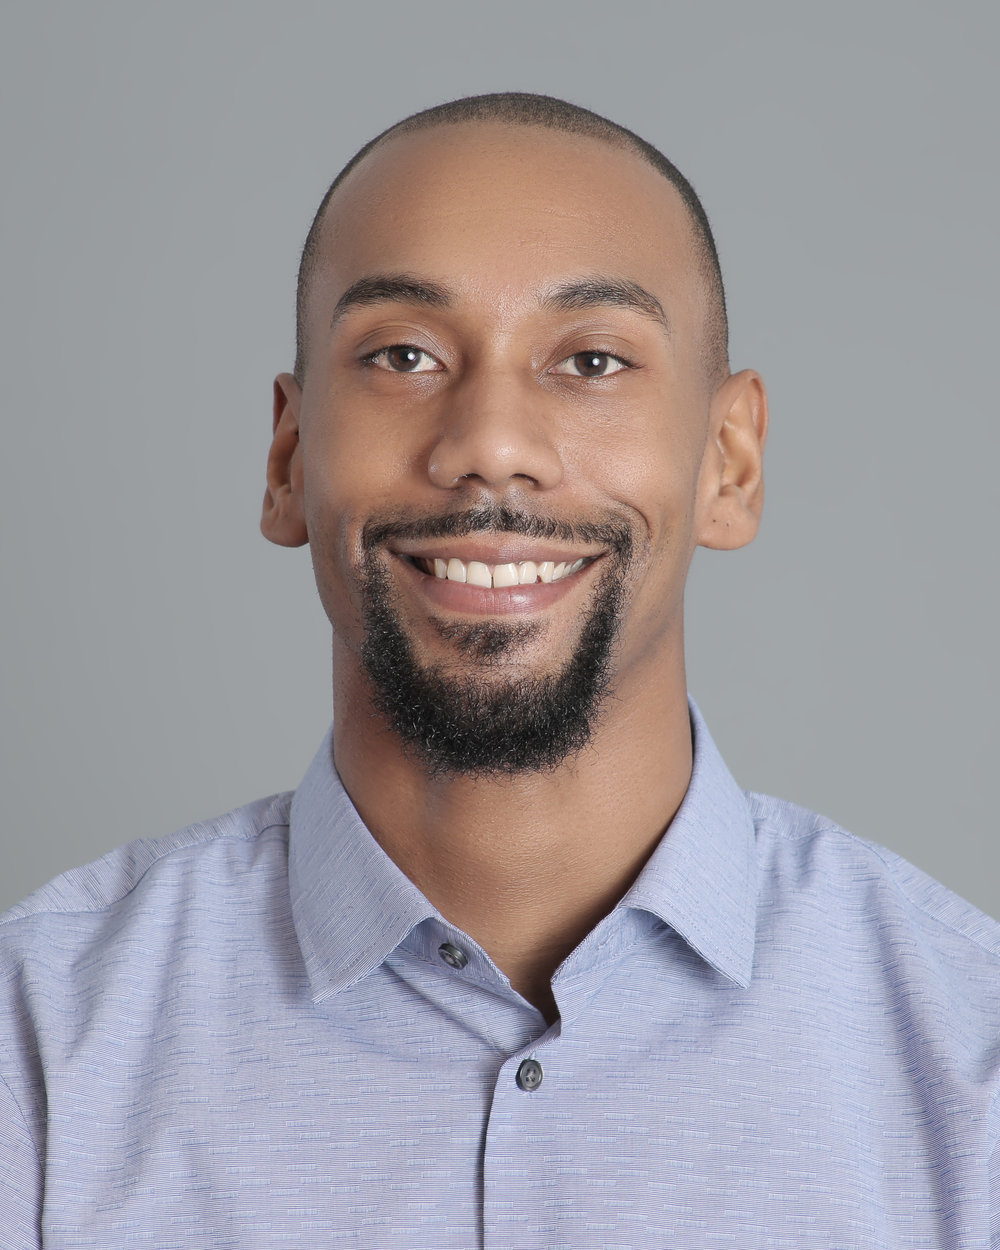 Maurice Hawkins - Owner & President of Marketing